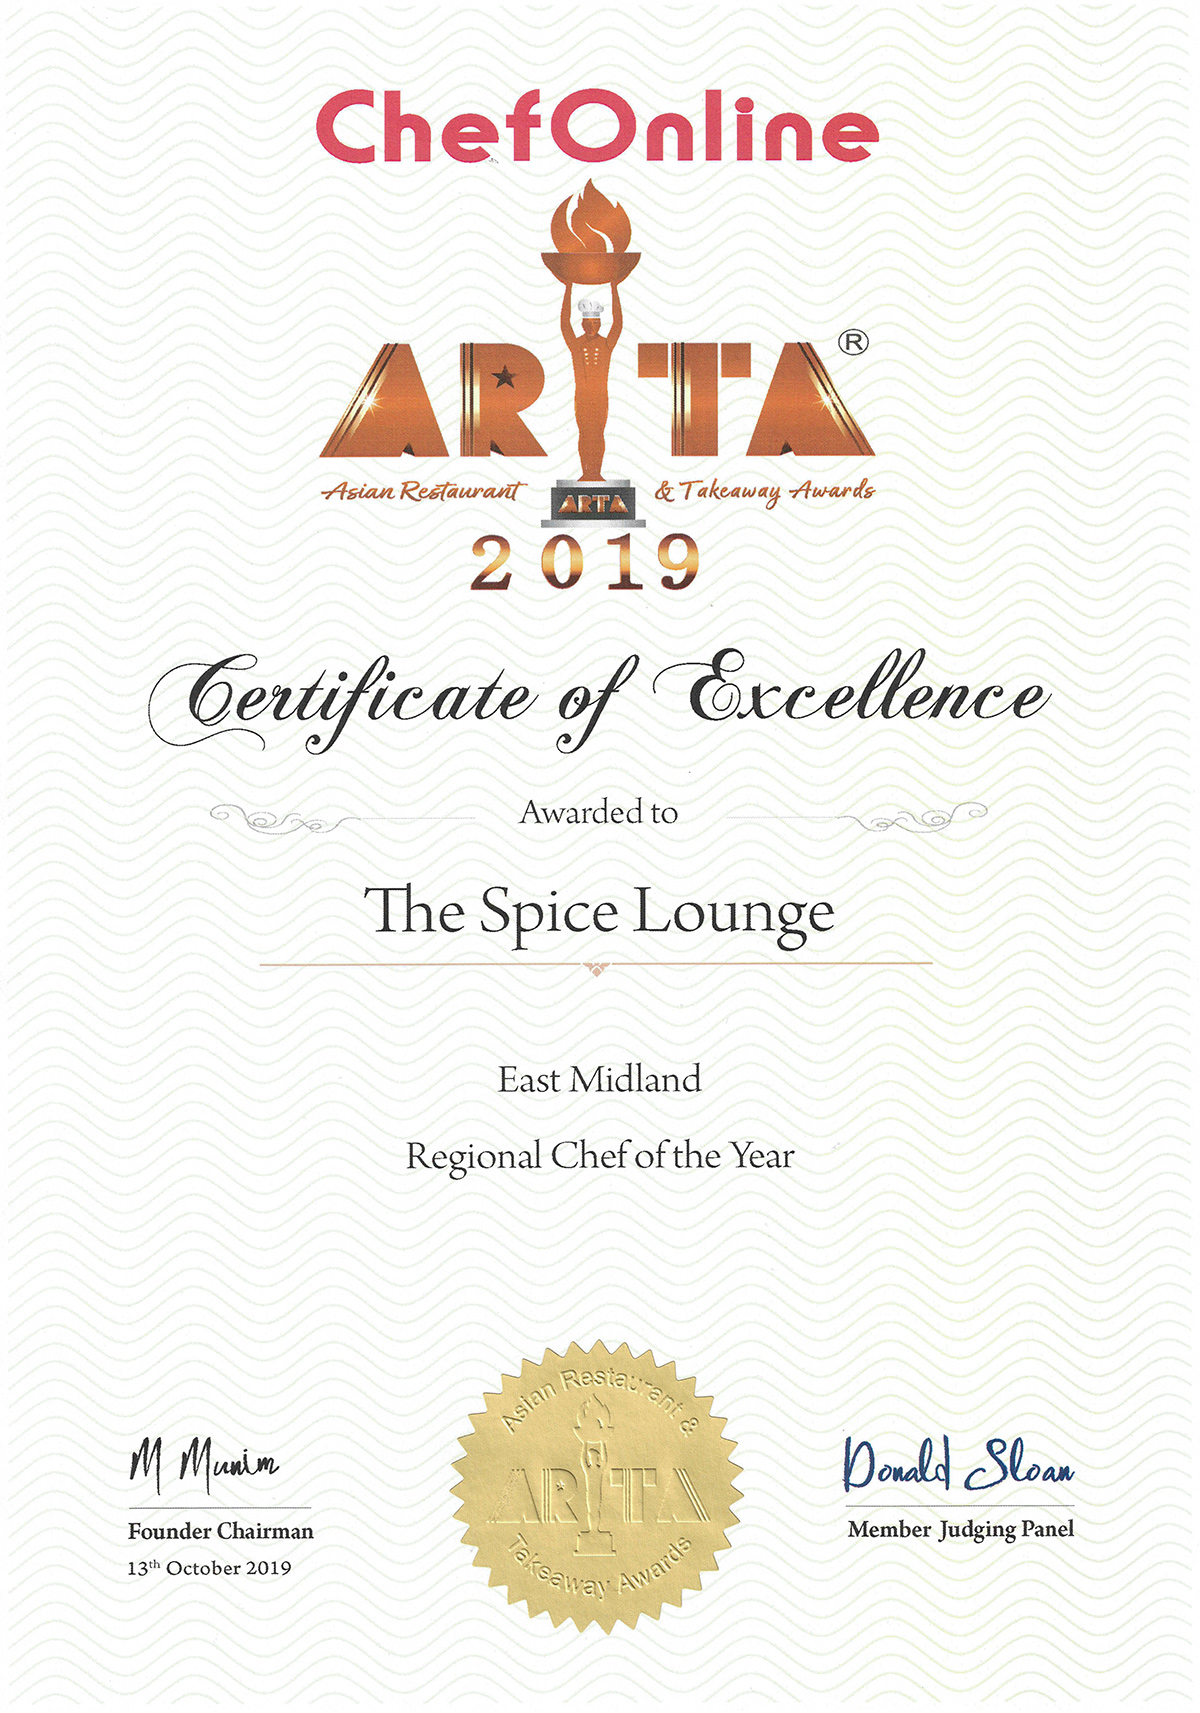 Award Winning Indian Restaurant & Takeaway in Higham Ferrers, Rushden